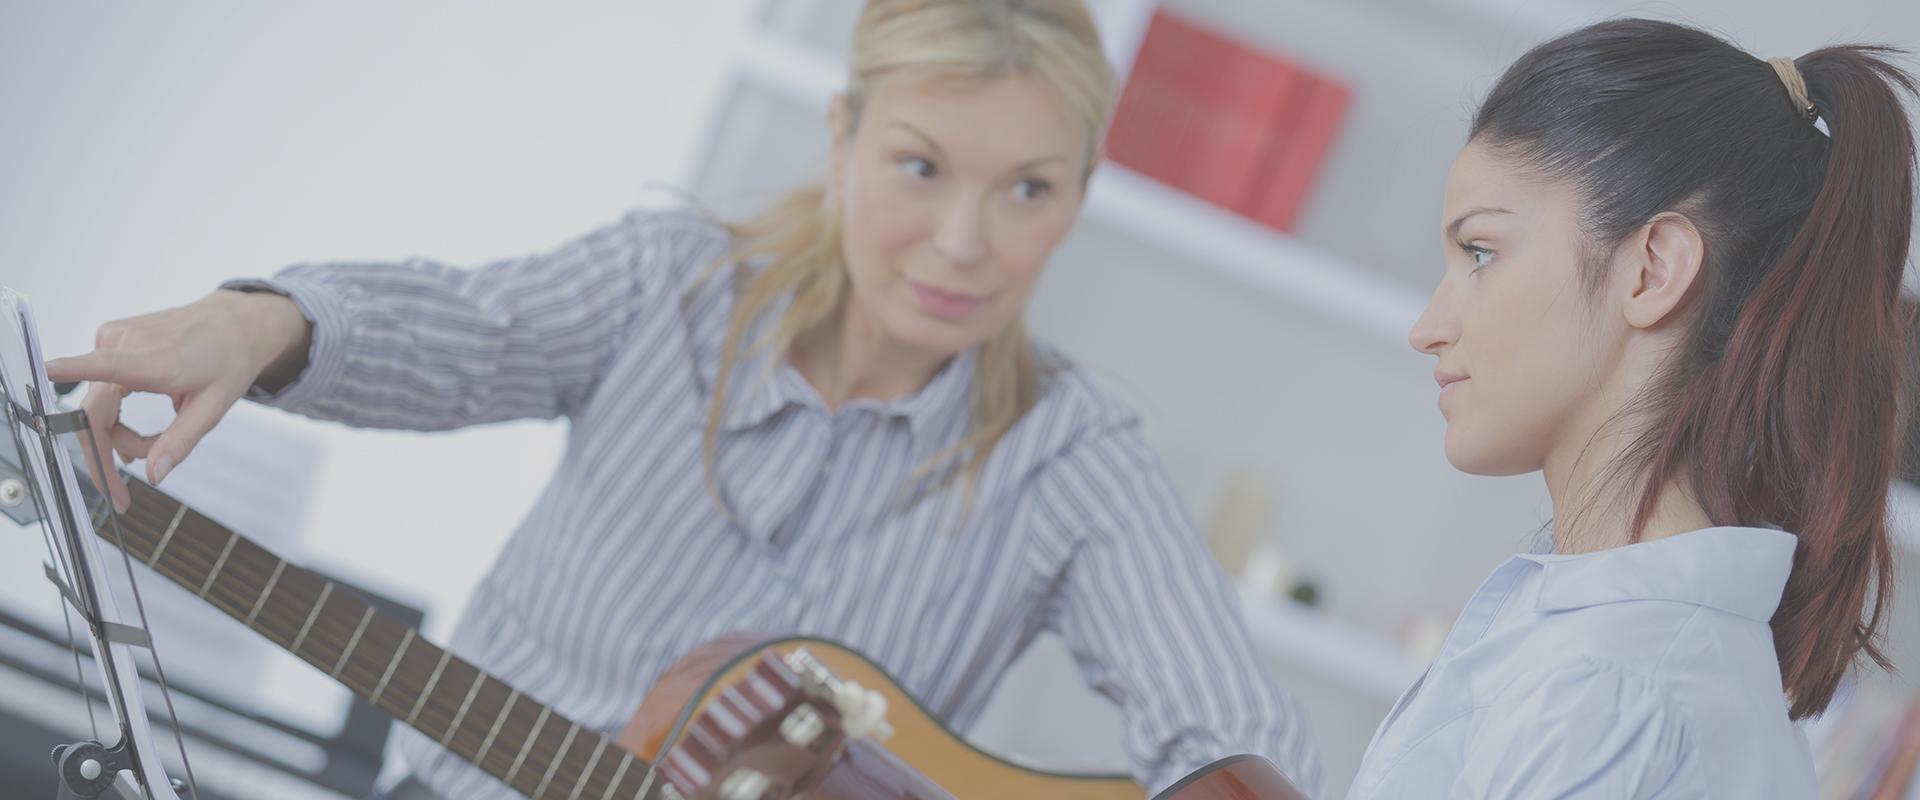 acheter et vendre une guitare doccasion